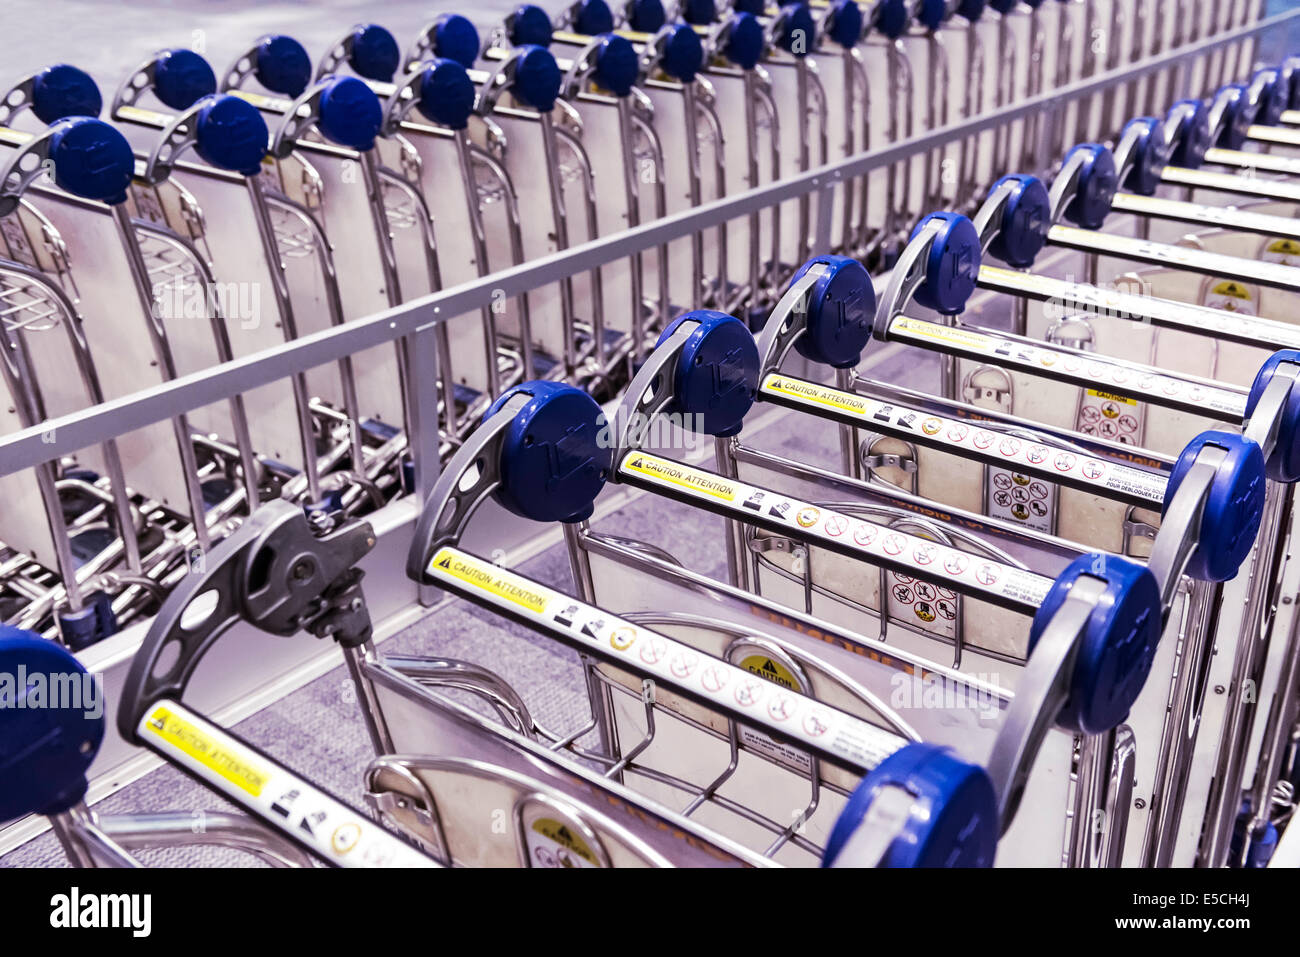 Gepäck-Wagen Vermietung am Toronto Pearson International Airport, Kanada Stockbild